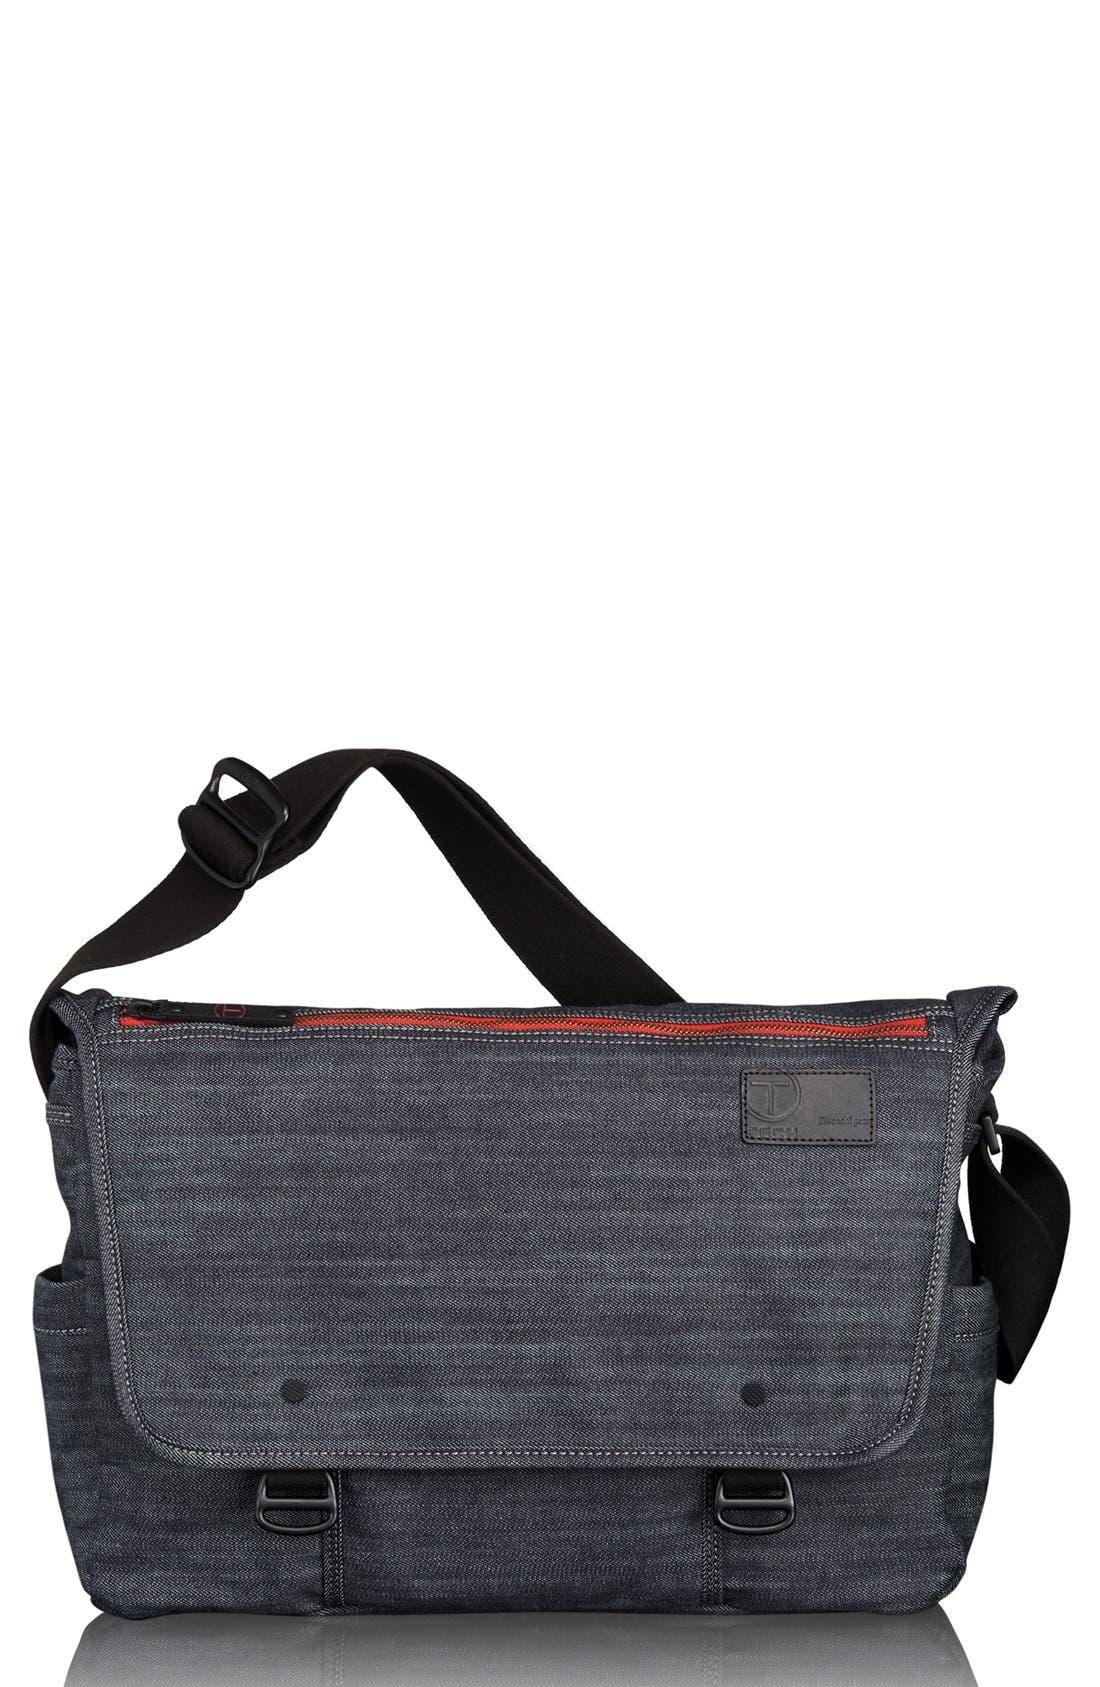 Main Image - T-Tech by Tumi 'Icon - Usher' Messenger Bag